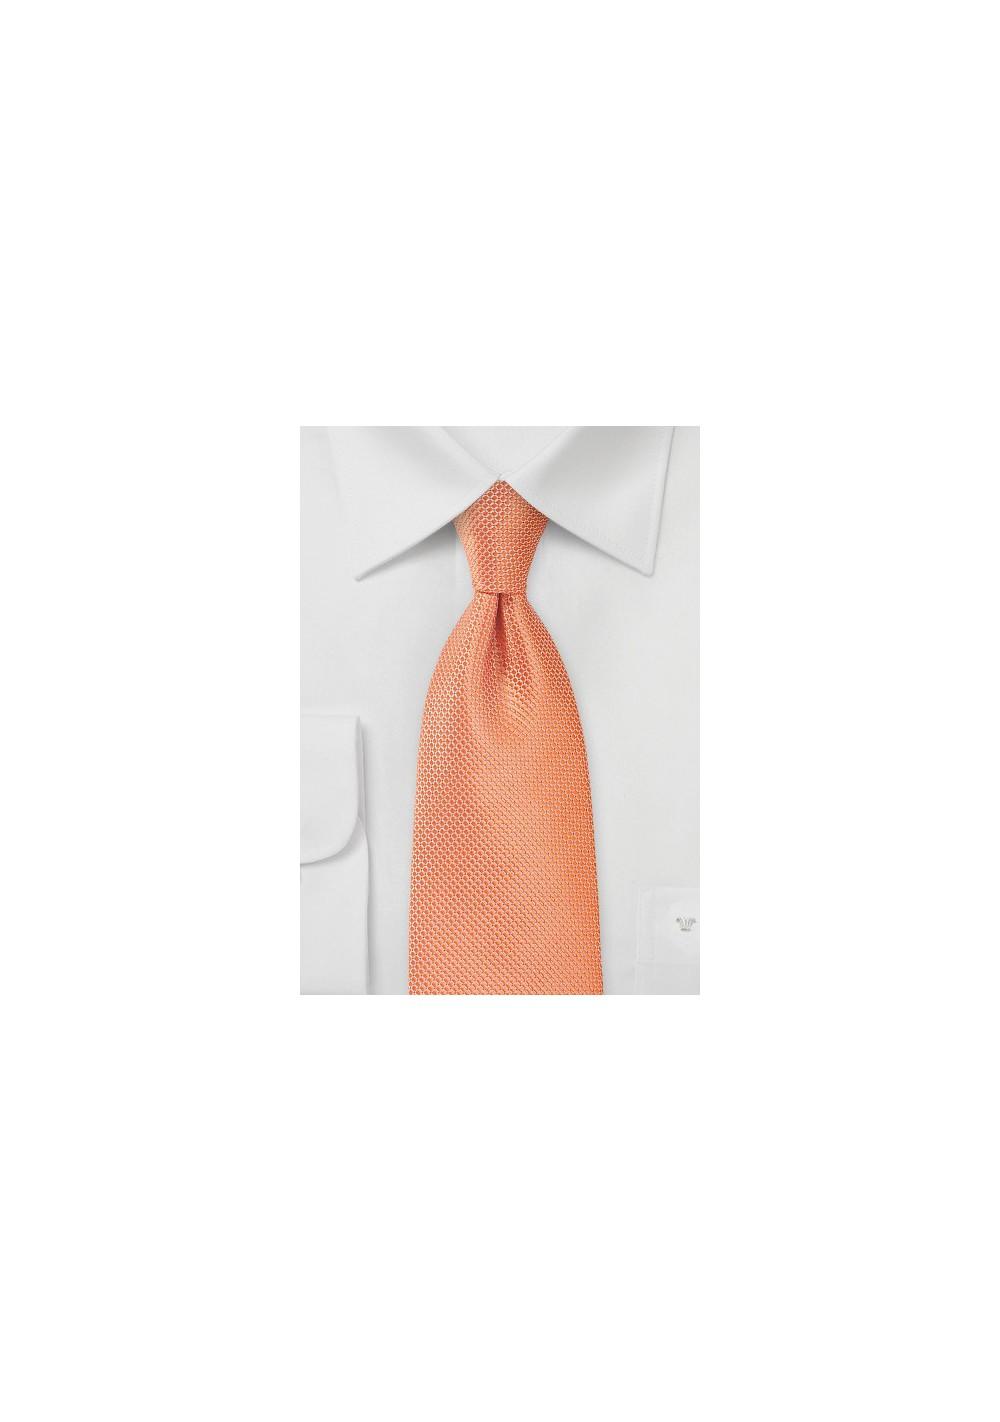 Mandarin Orange Hued Kids Sized Tie